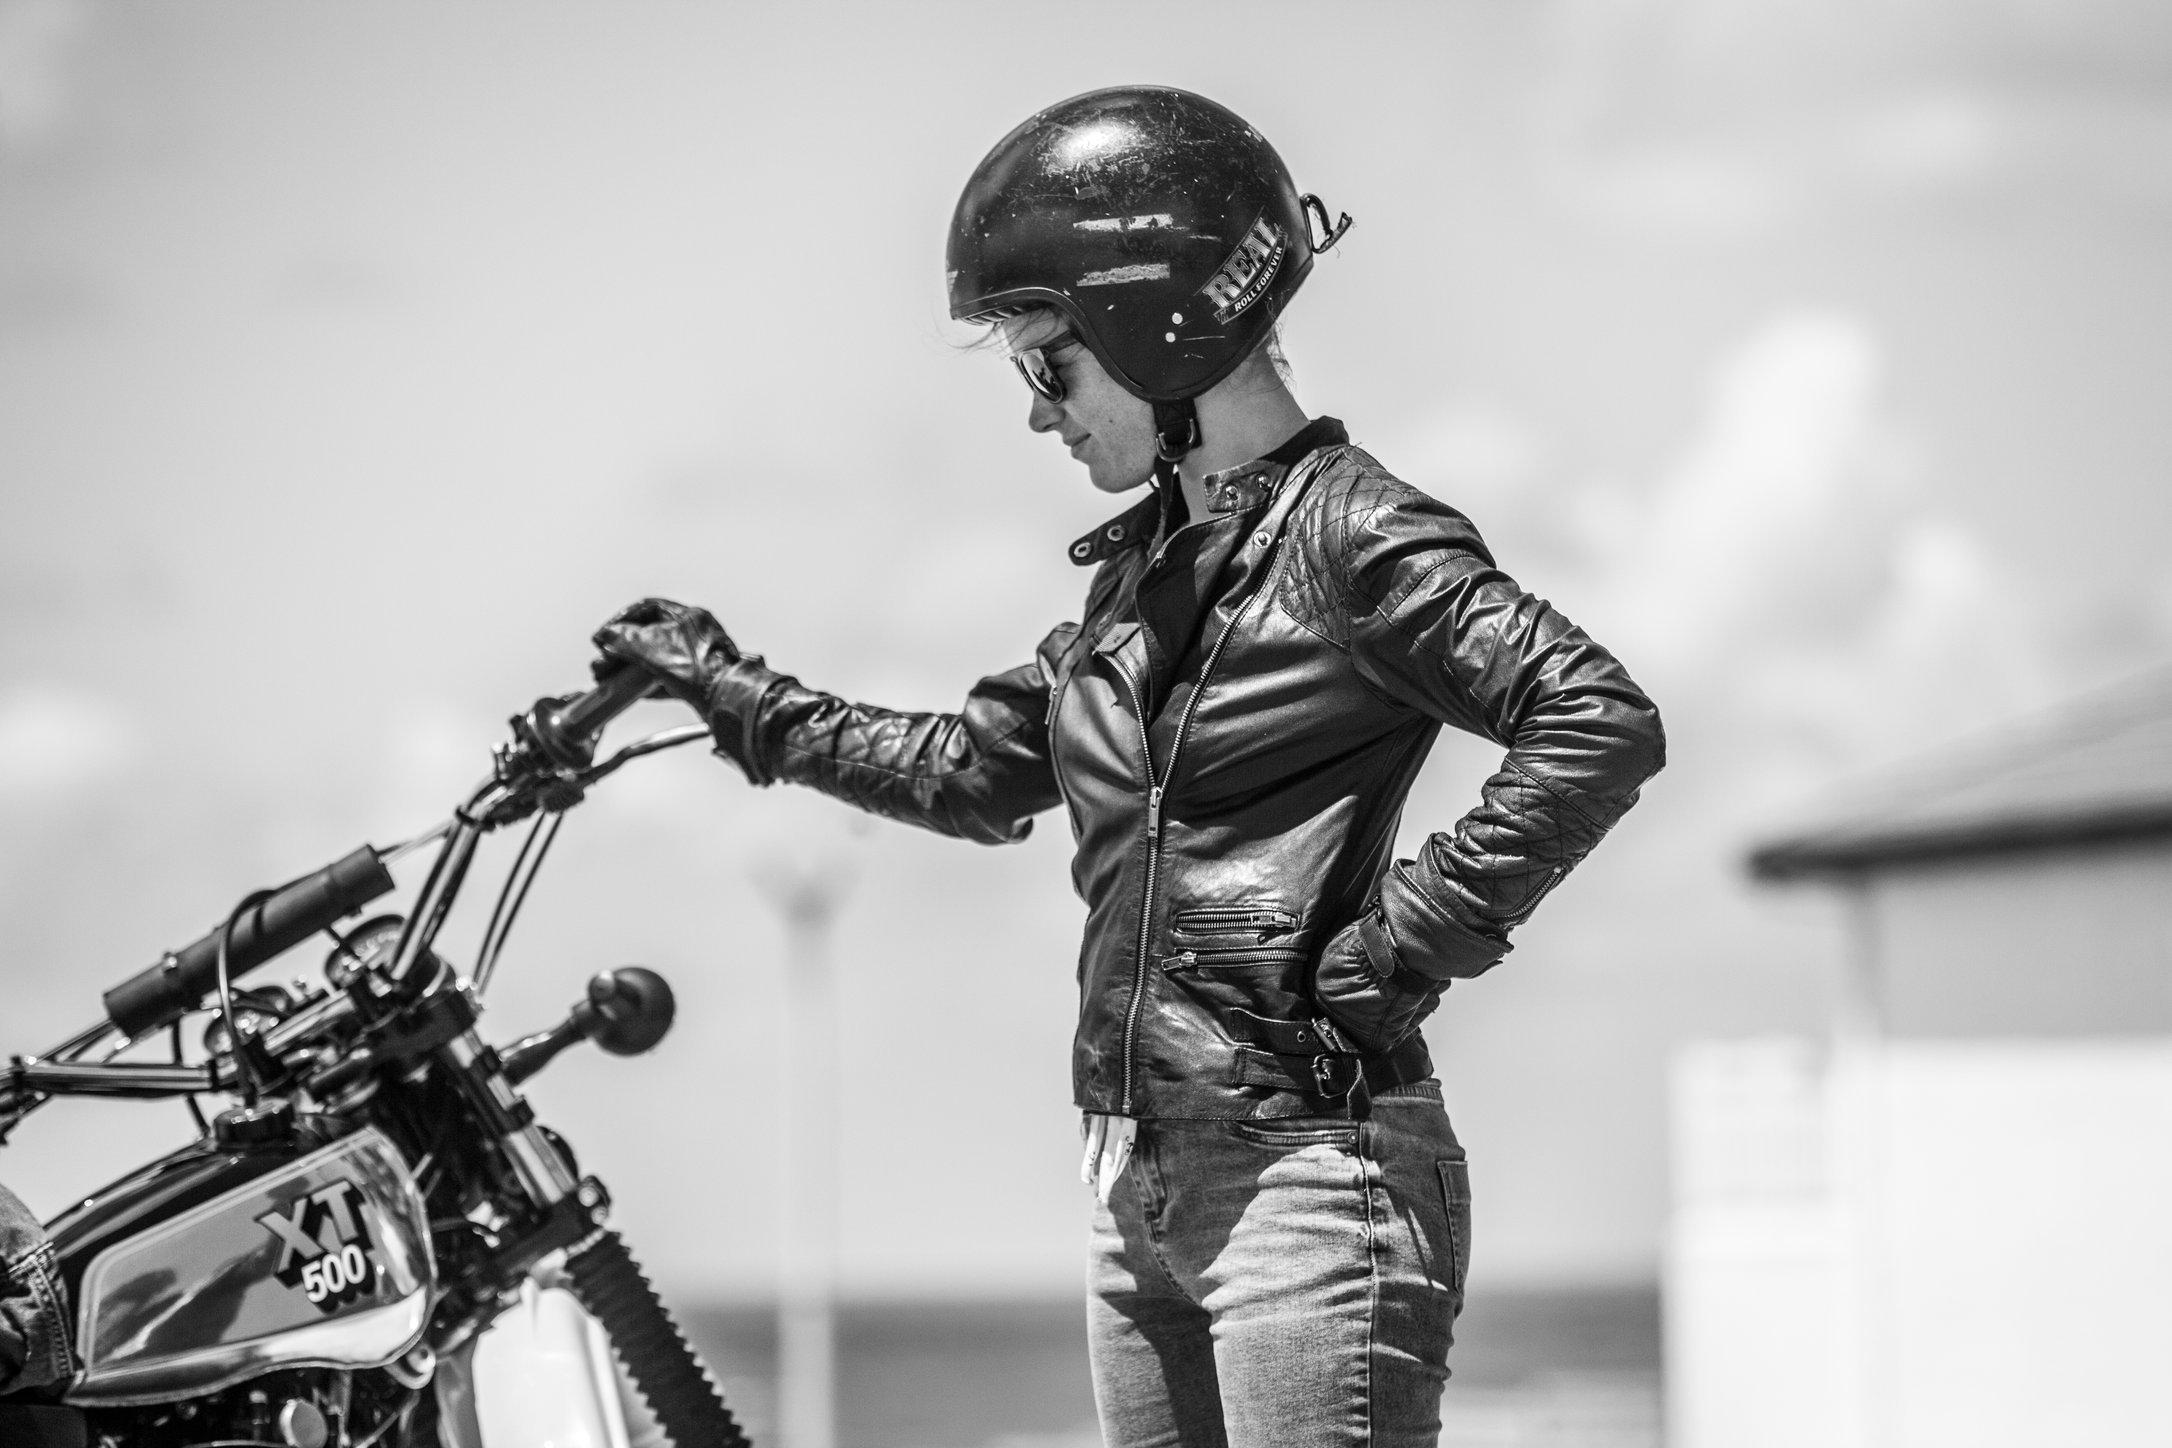 Get ready for a Ride   Yamaha XT 500